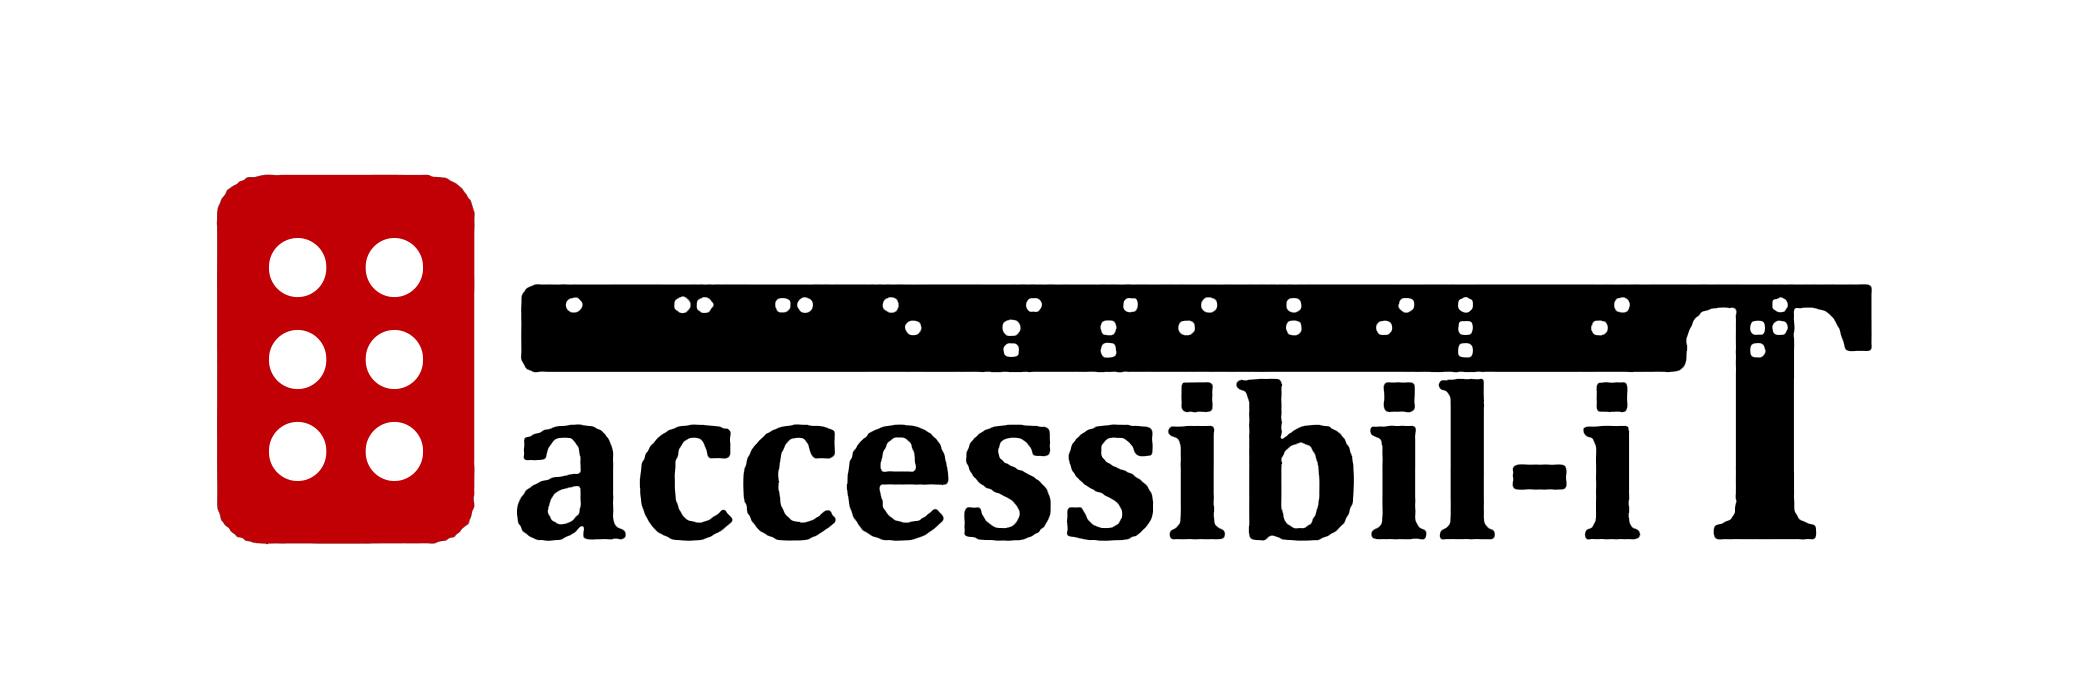 https://0901.nccdn.net/4_2/000/000/03f/ac7/Accessibil_iT_Logo-1-.jpg